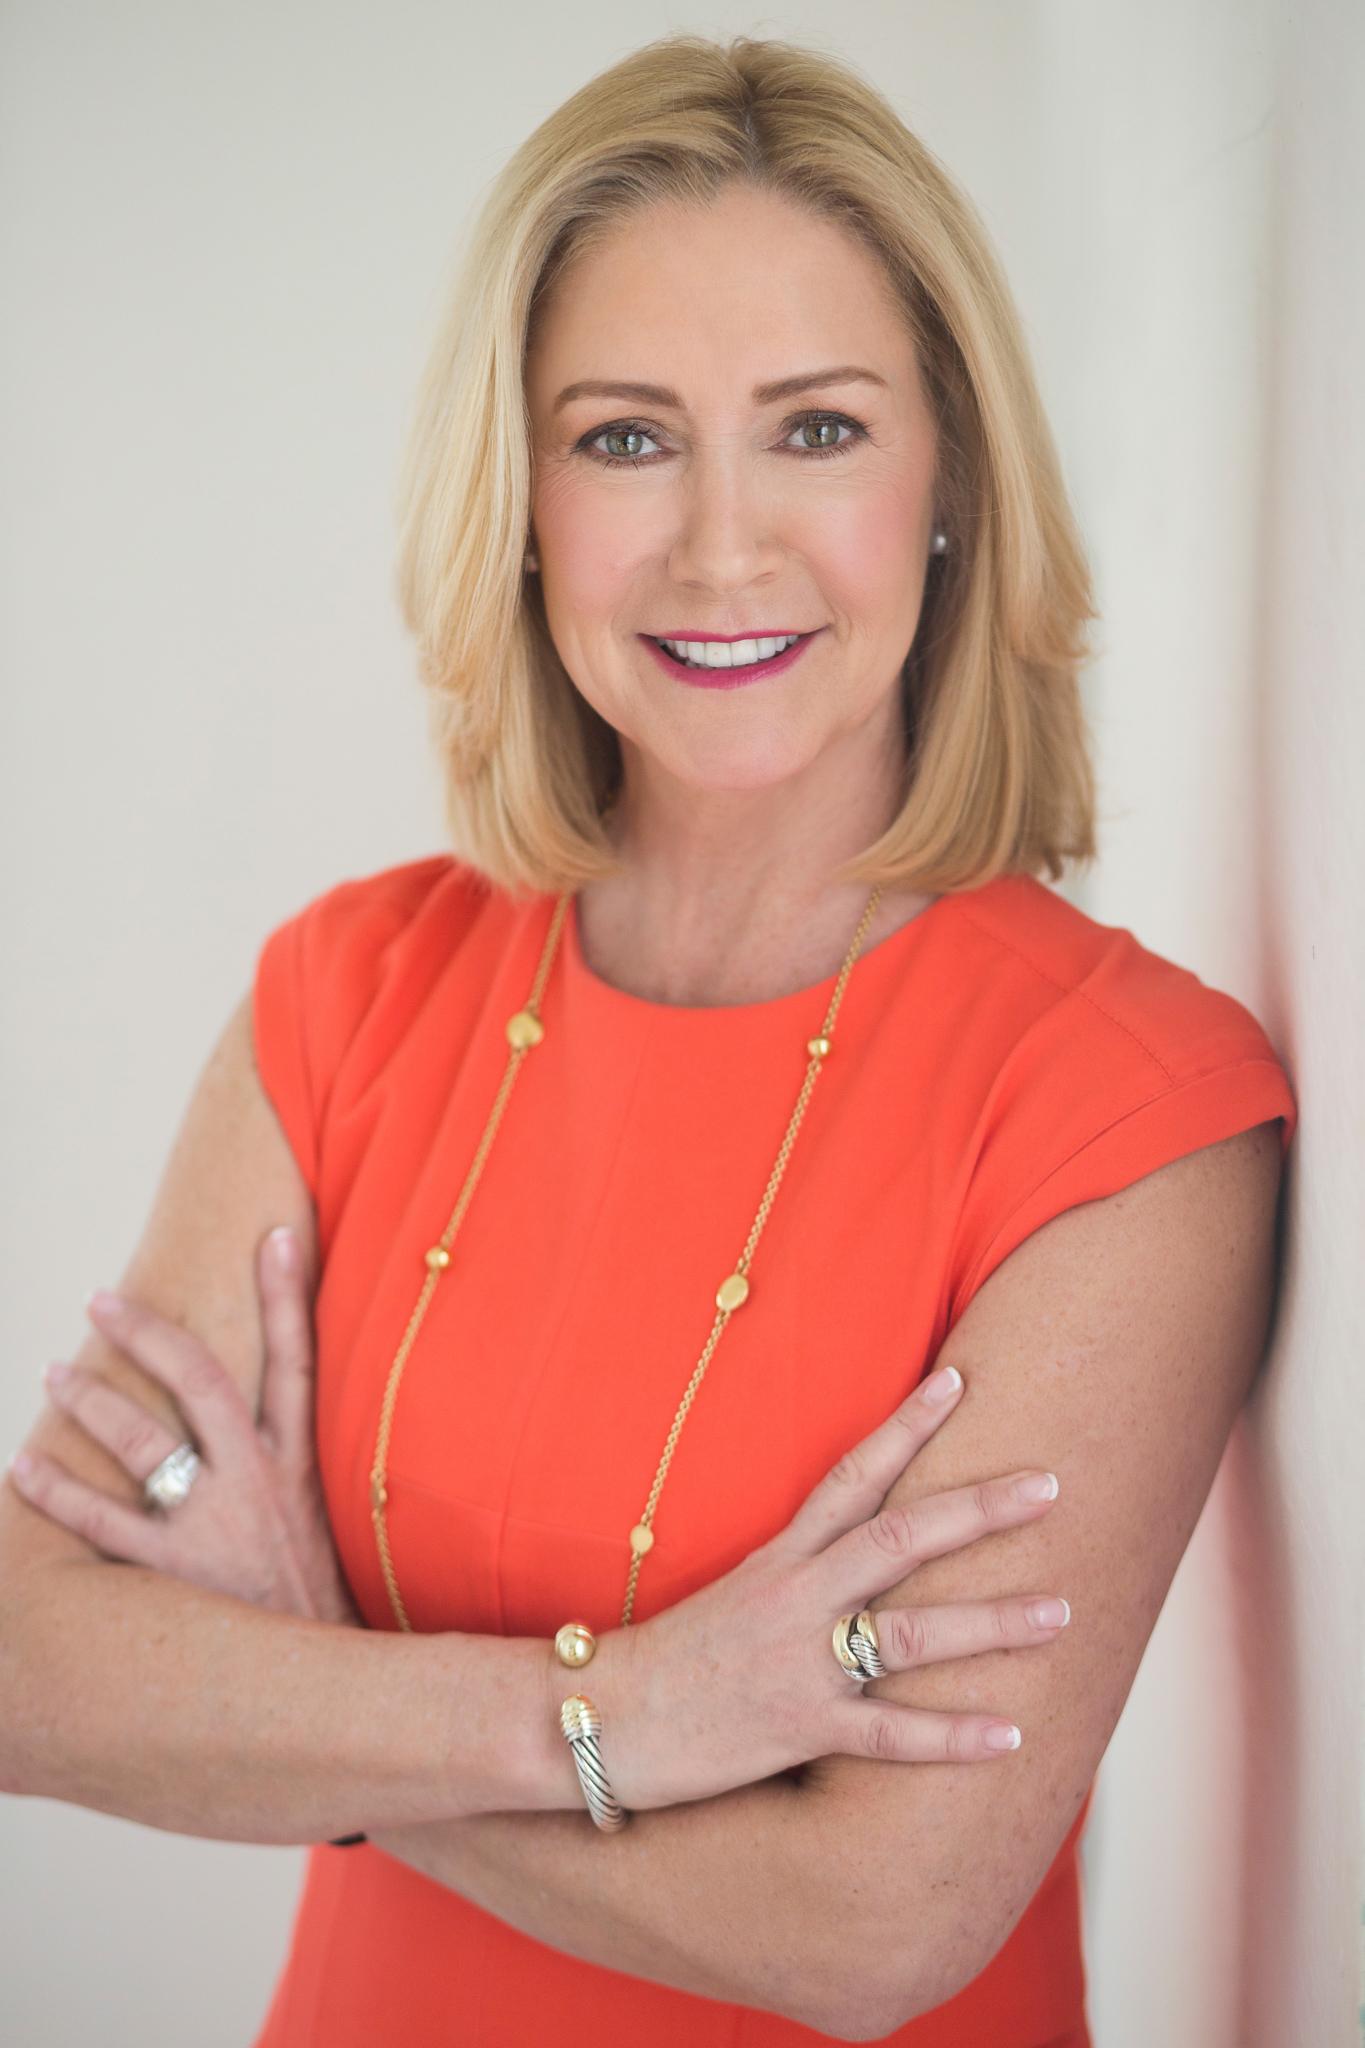 Lisa Damico Portraits │DC Arlington Alexandria Headshot │Social Engagement Sales Representative Headshot